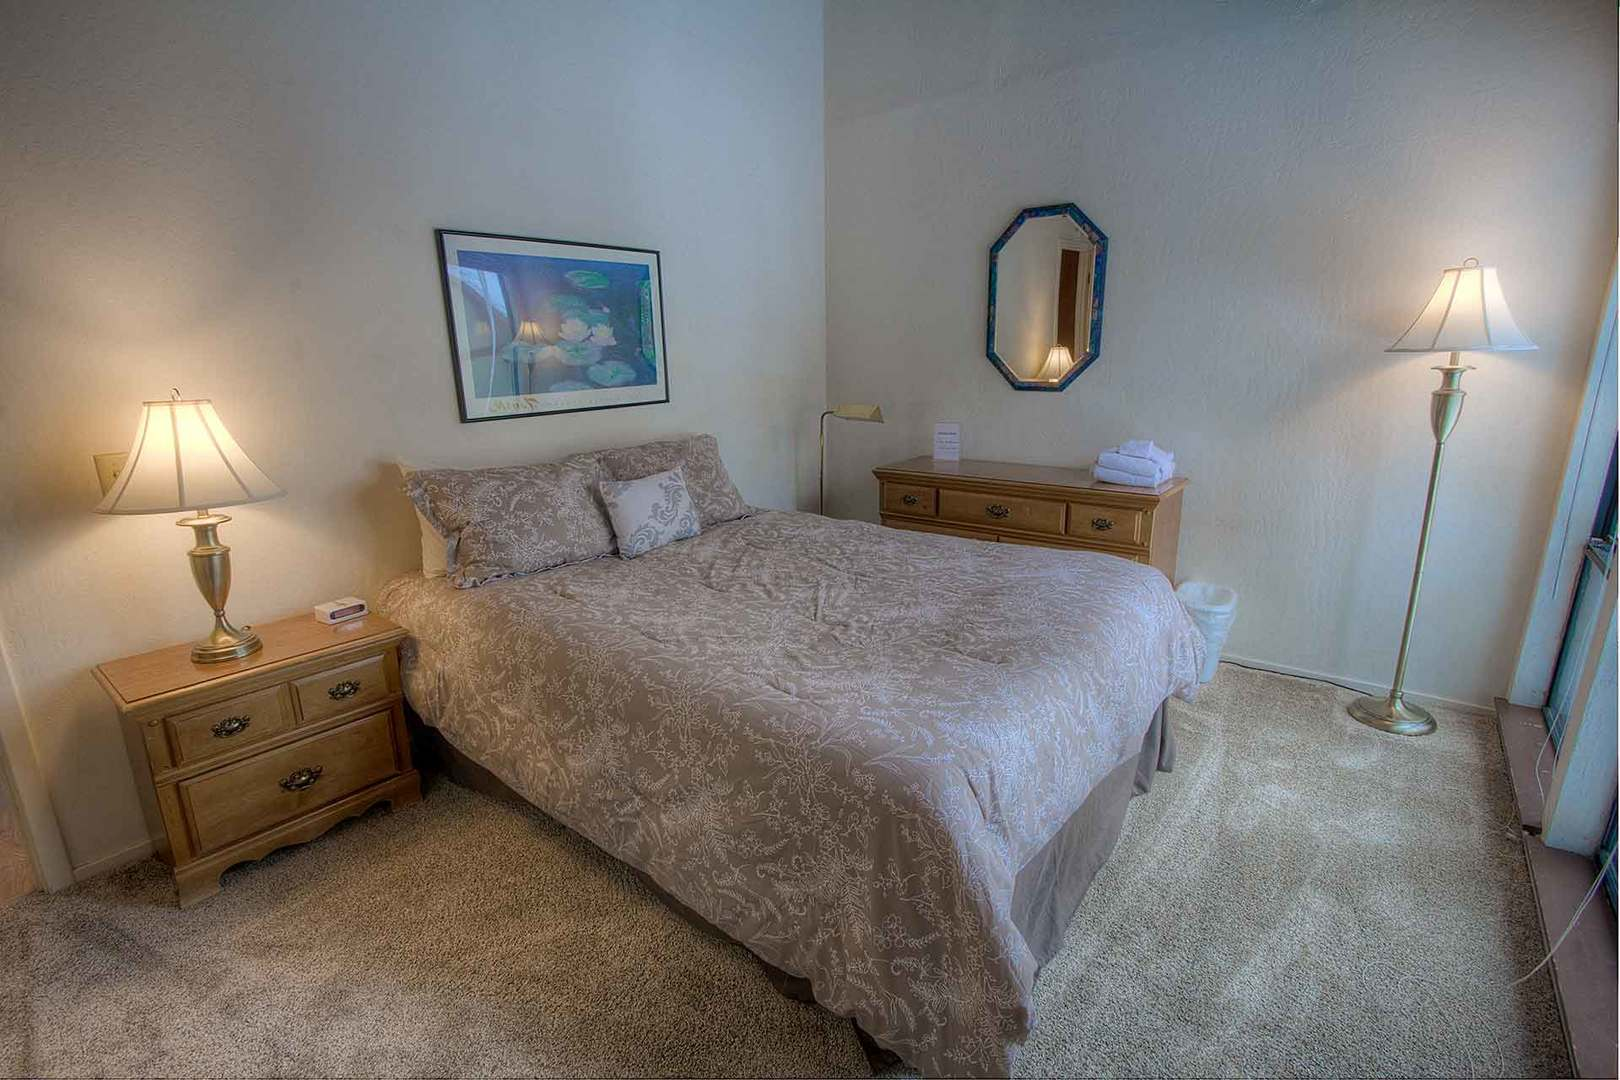 kwc1030 bedroom